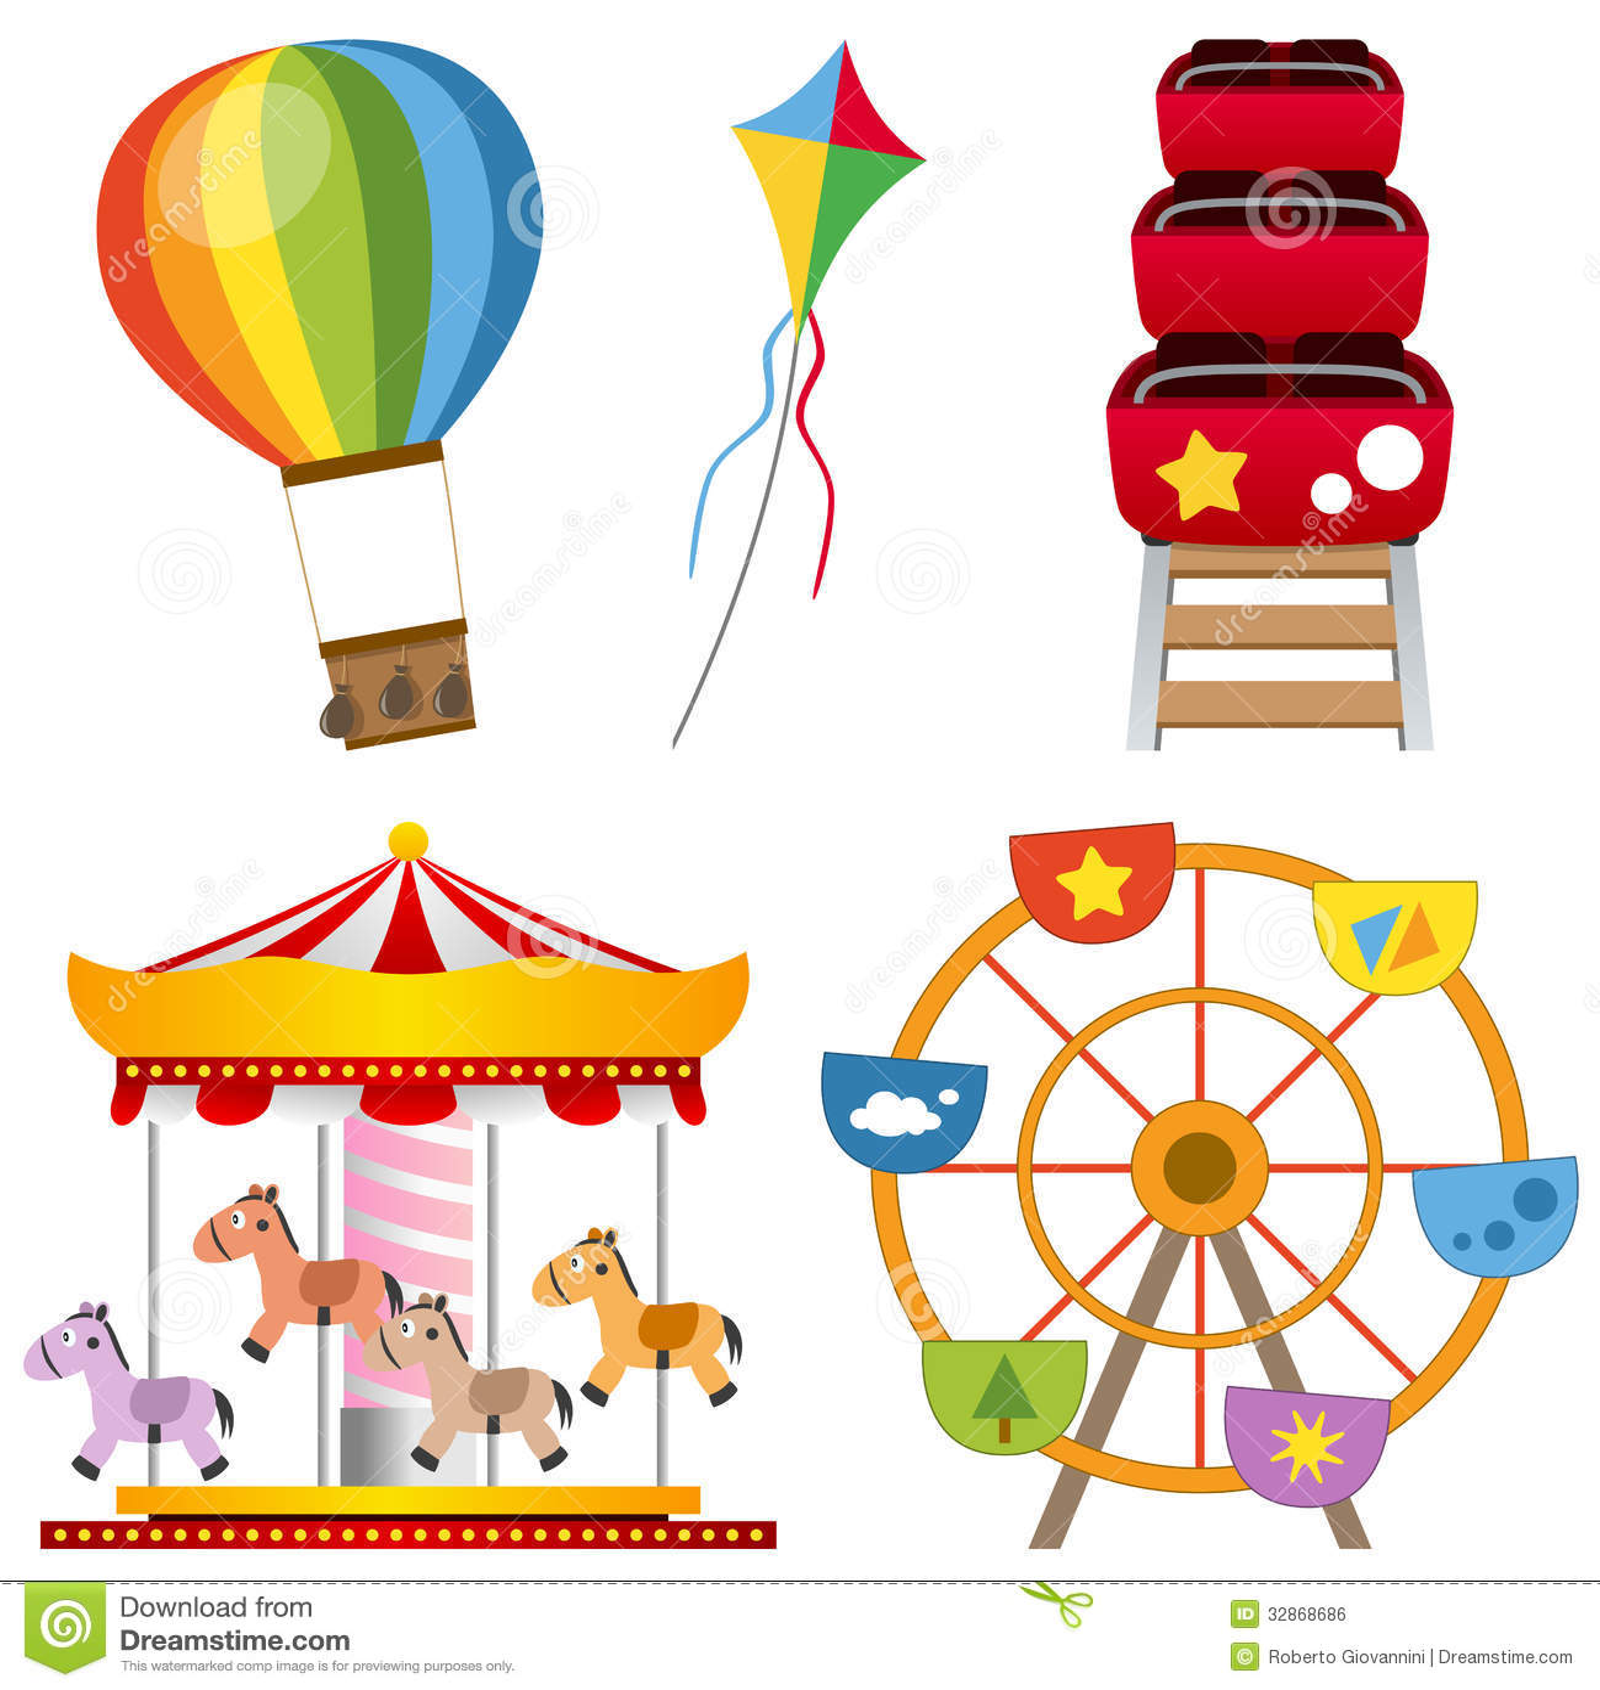 park attractions set: a hot air balloon, a kite, a roller coaster ...